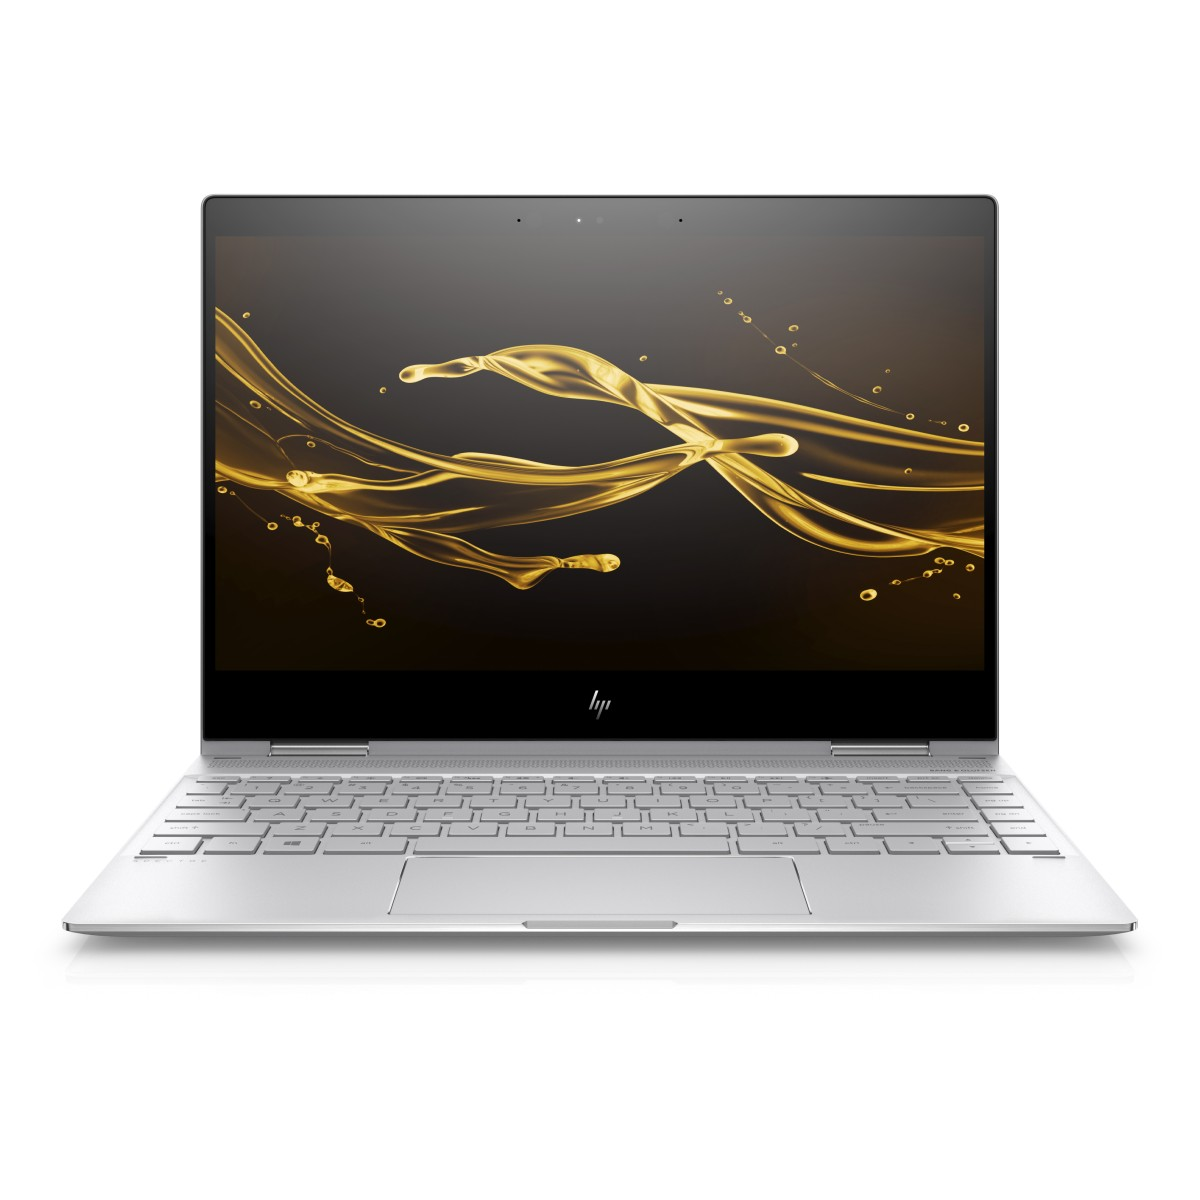 HP Spectre 13 x360-ae005nc FHD i5-8250U/8GB/256SSD/2RServis/W10-silver